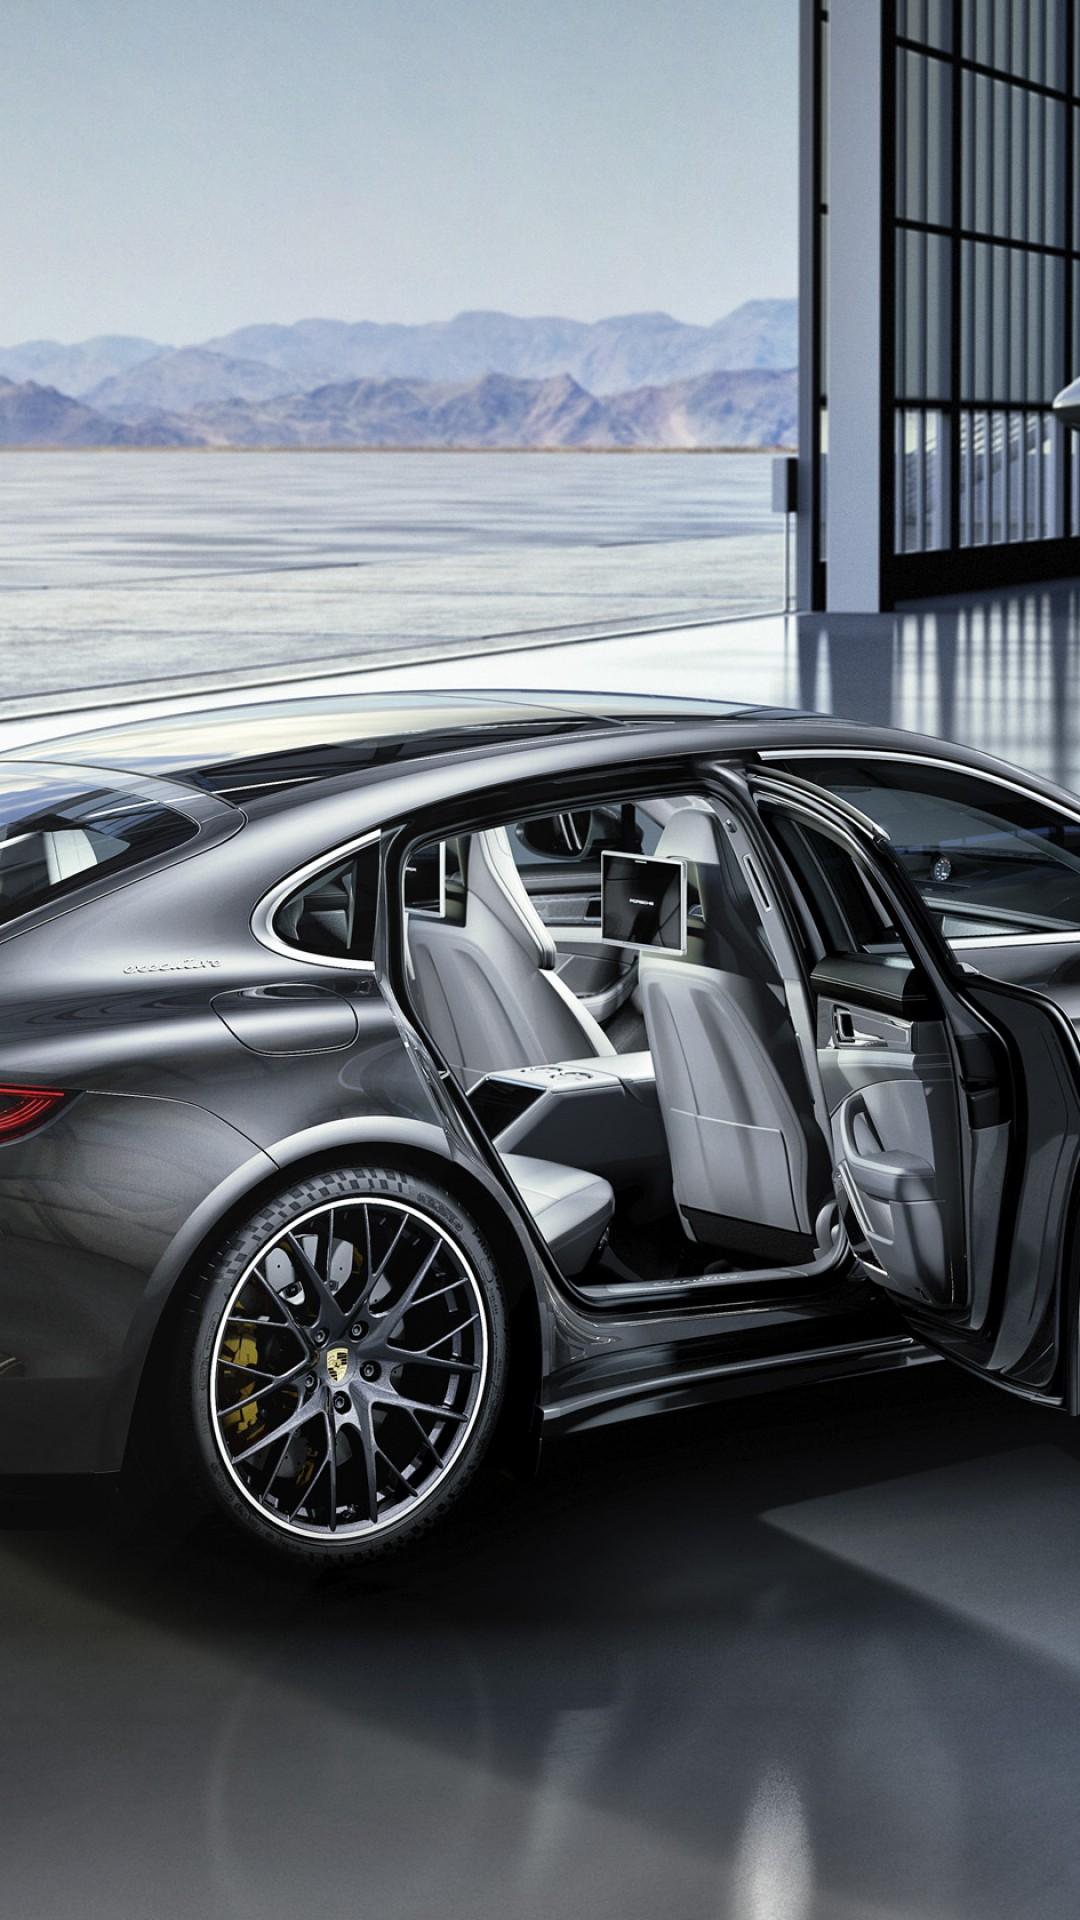 Aston Martin Vantage >> Wallpaper Porsche Panamera Turbo, silver, interior, Cars ...